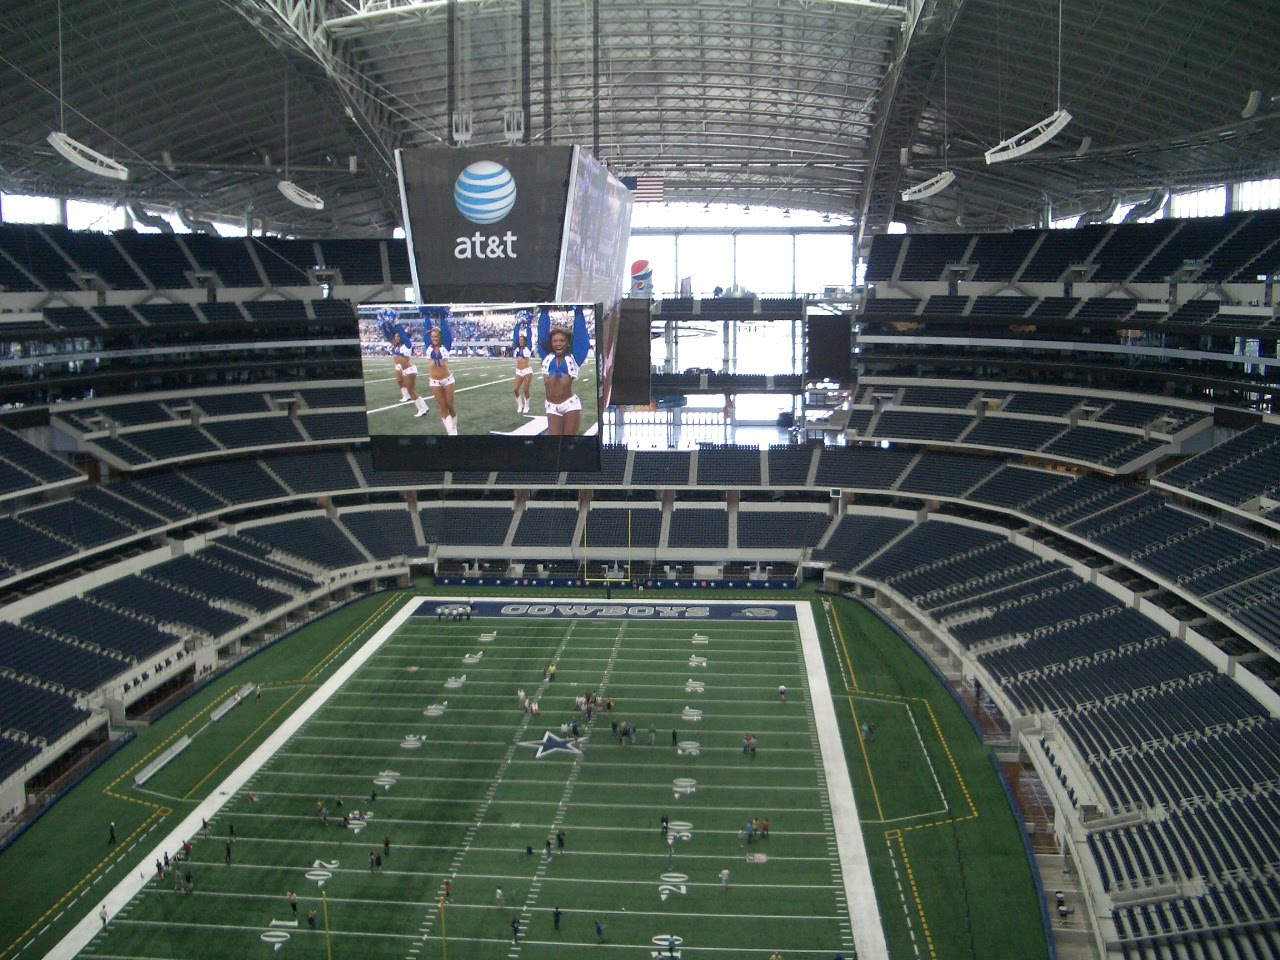 Where's Chuck: Dallas Cowboys Stadium Tour